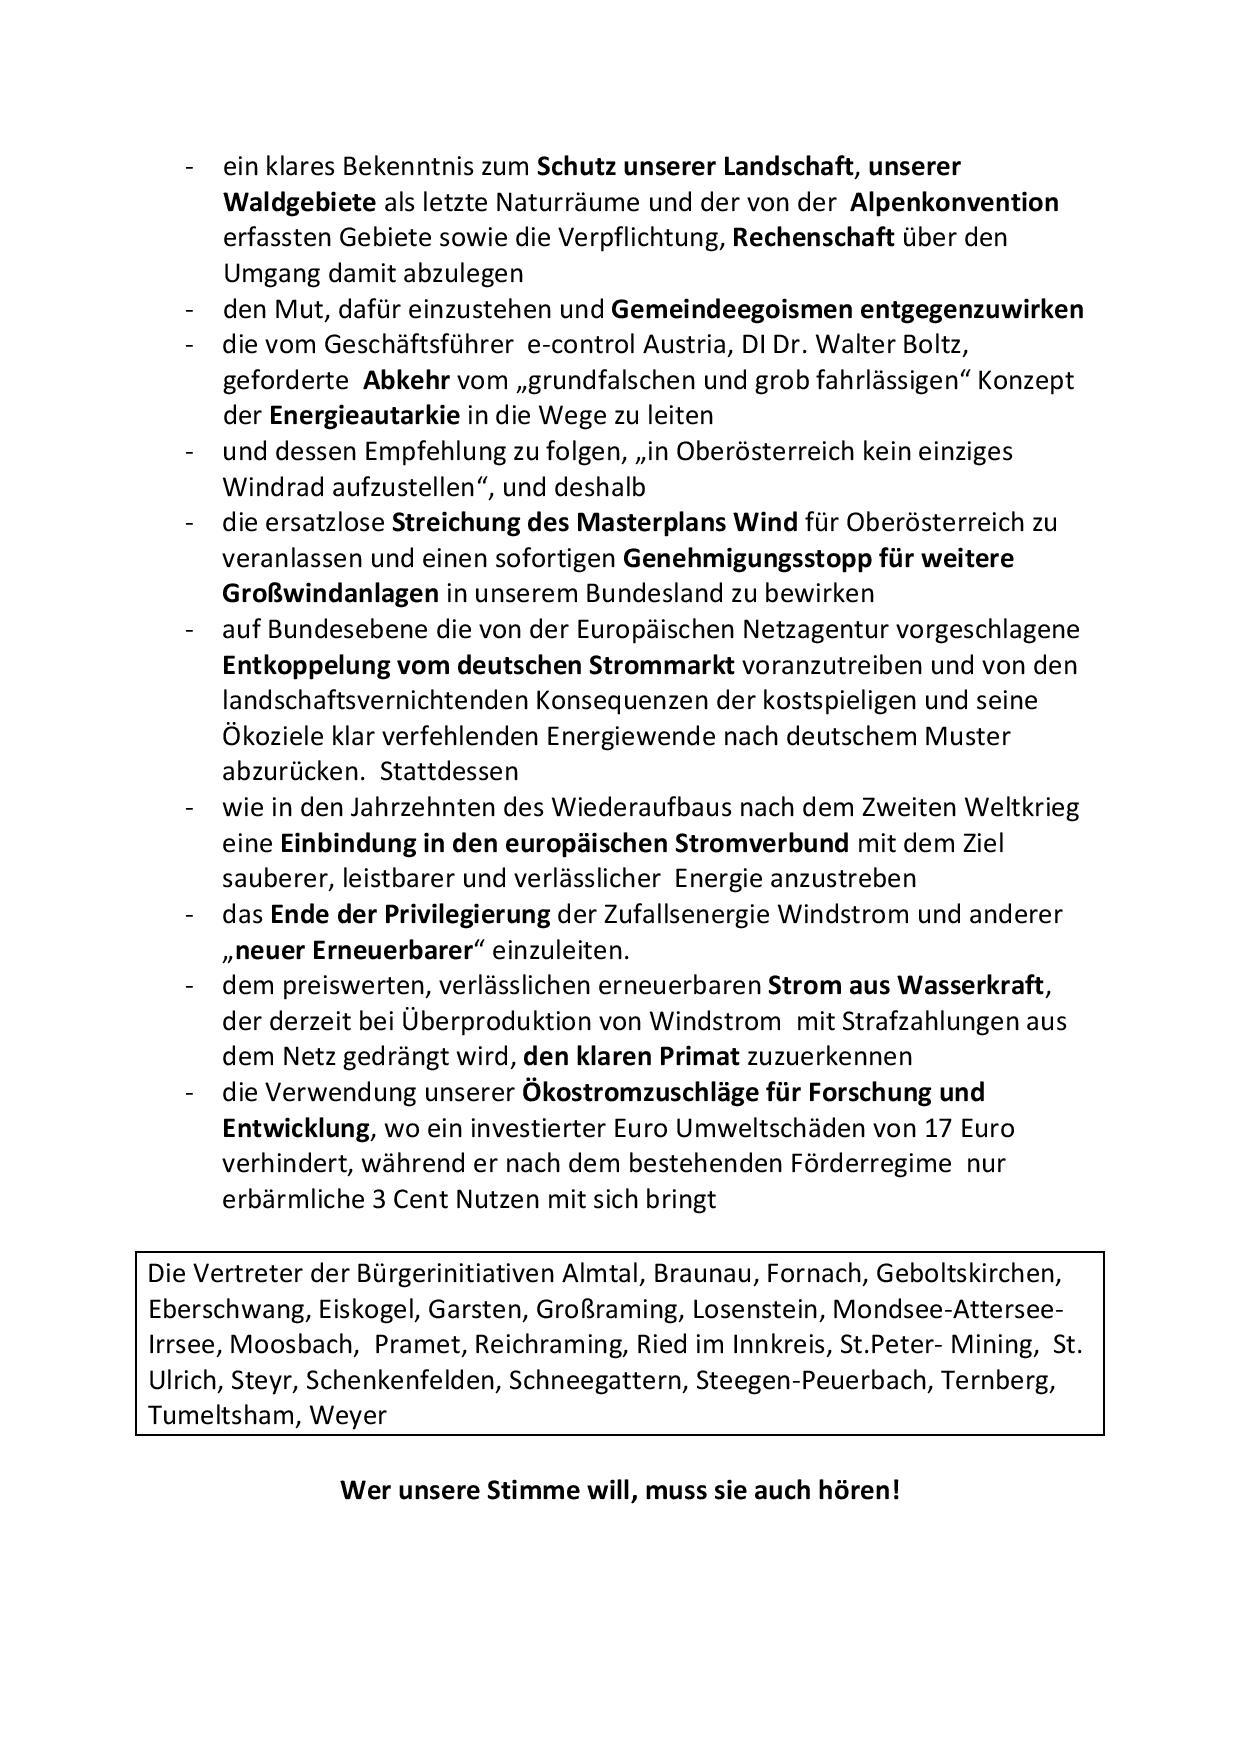 PositionspapierLandschaftsschutz (3)(Aschenberger)-page-002